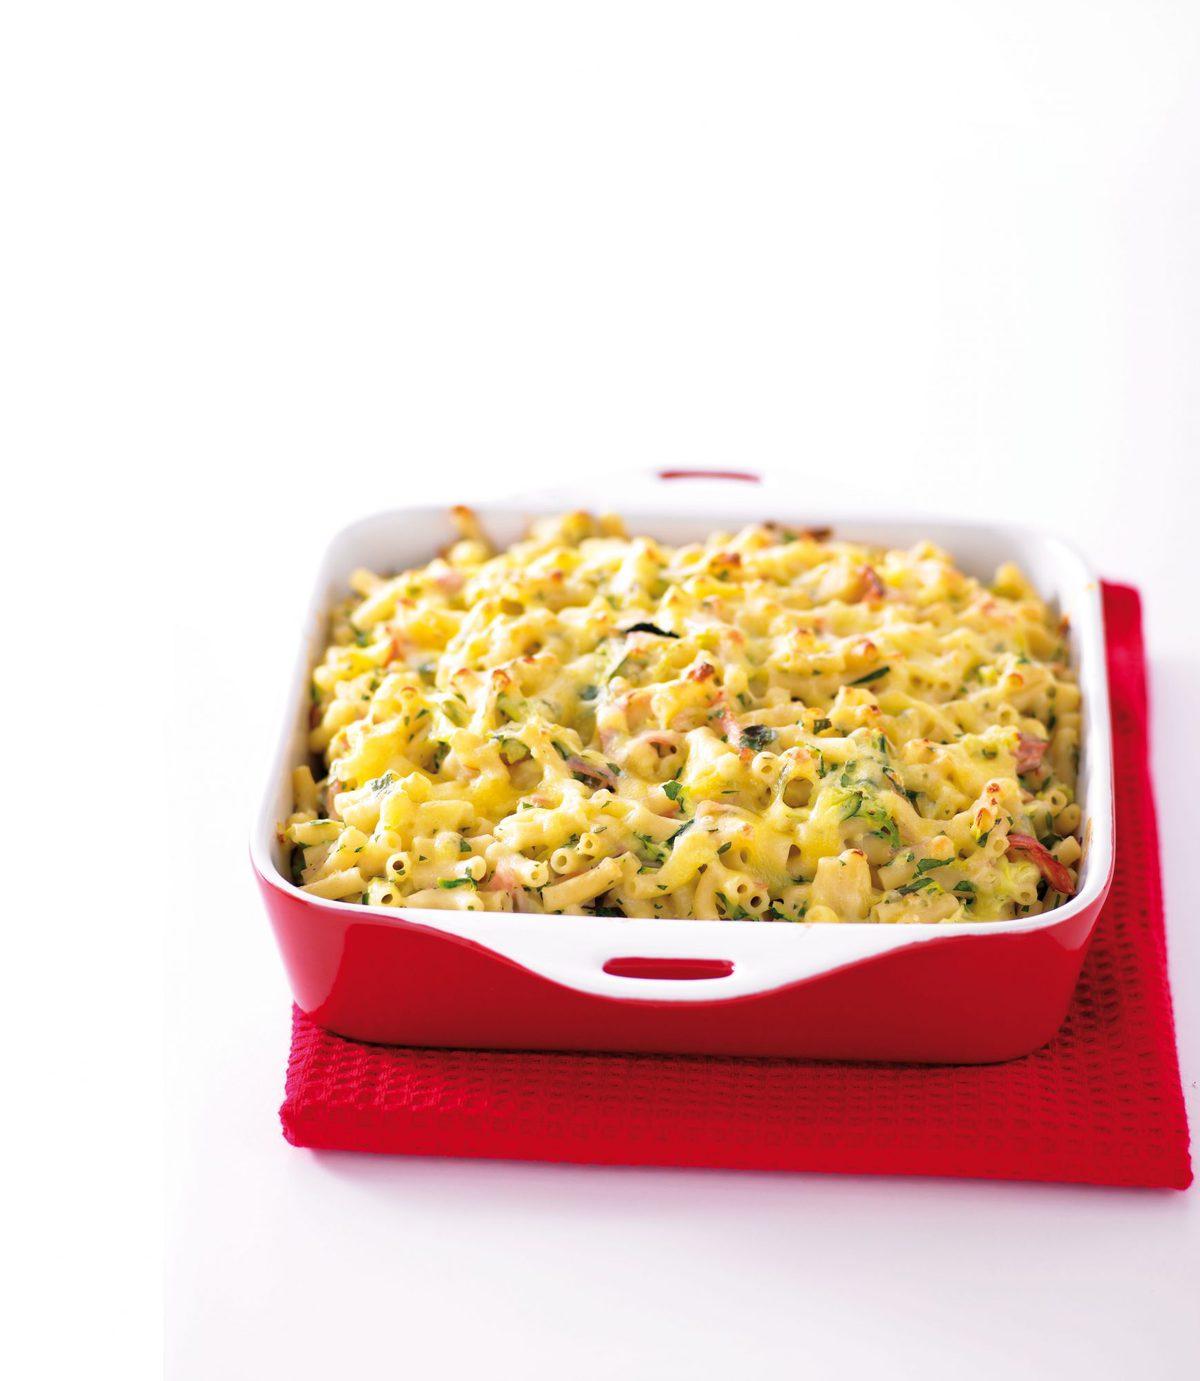 Ham, courgette and macaroni bake